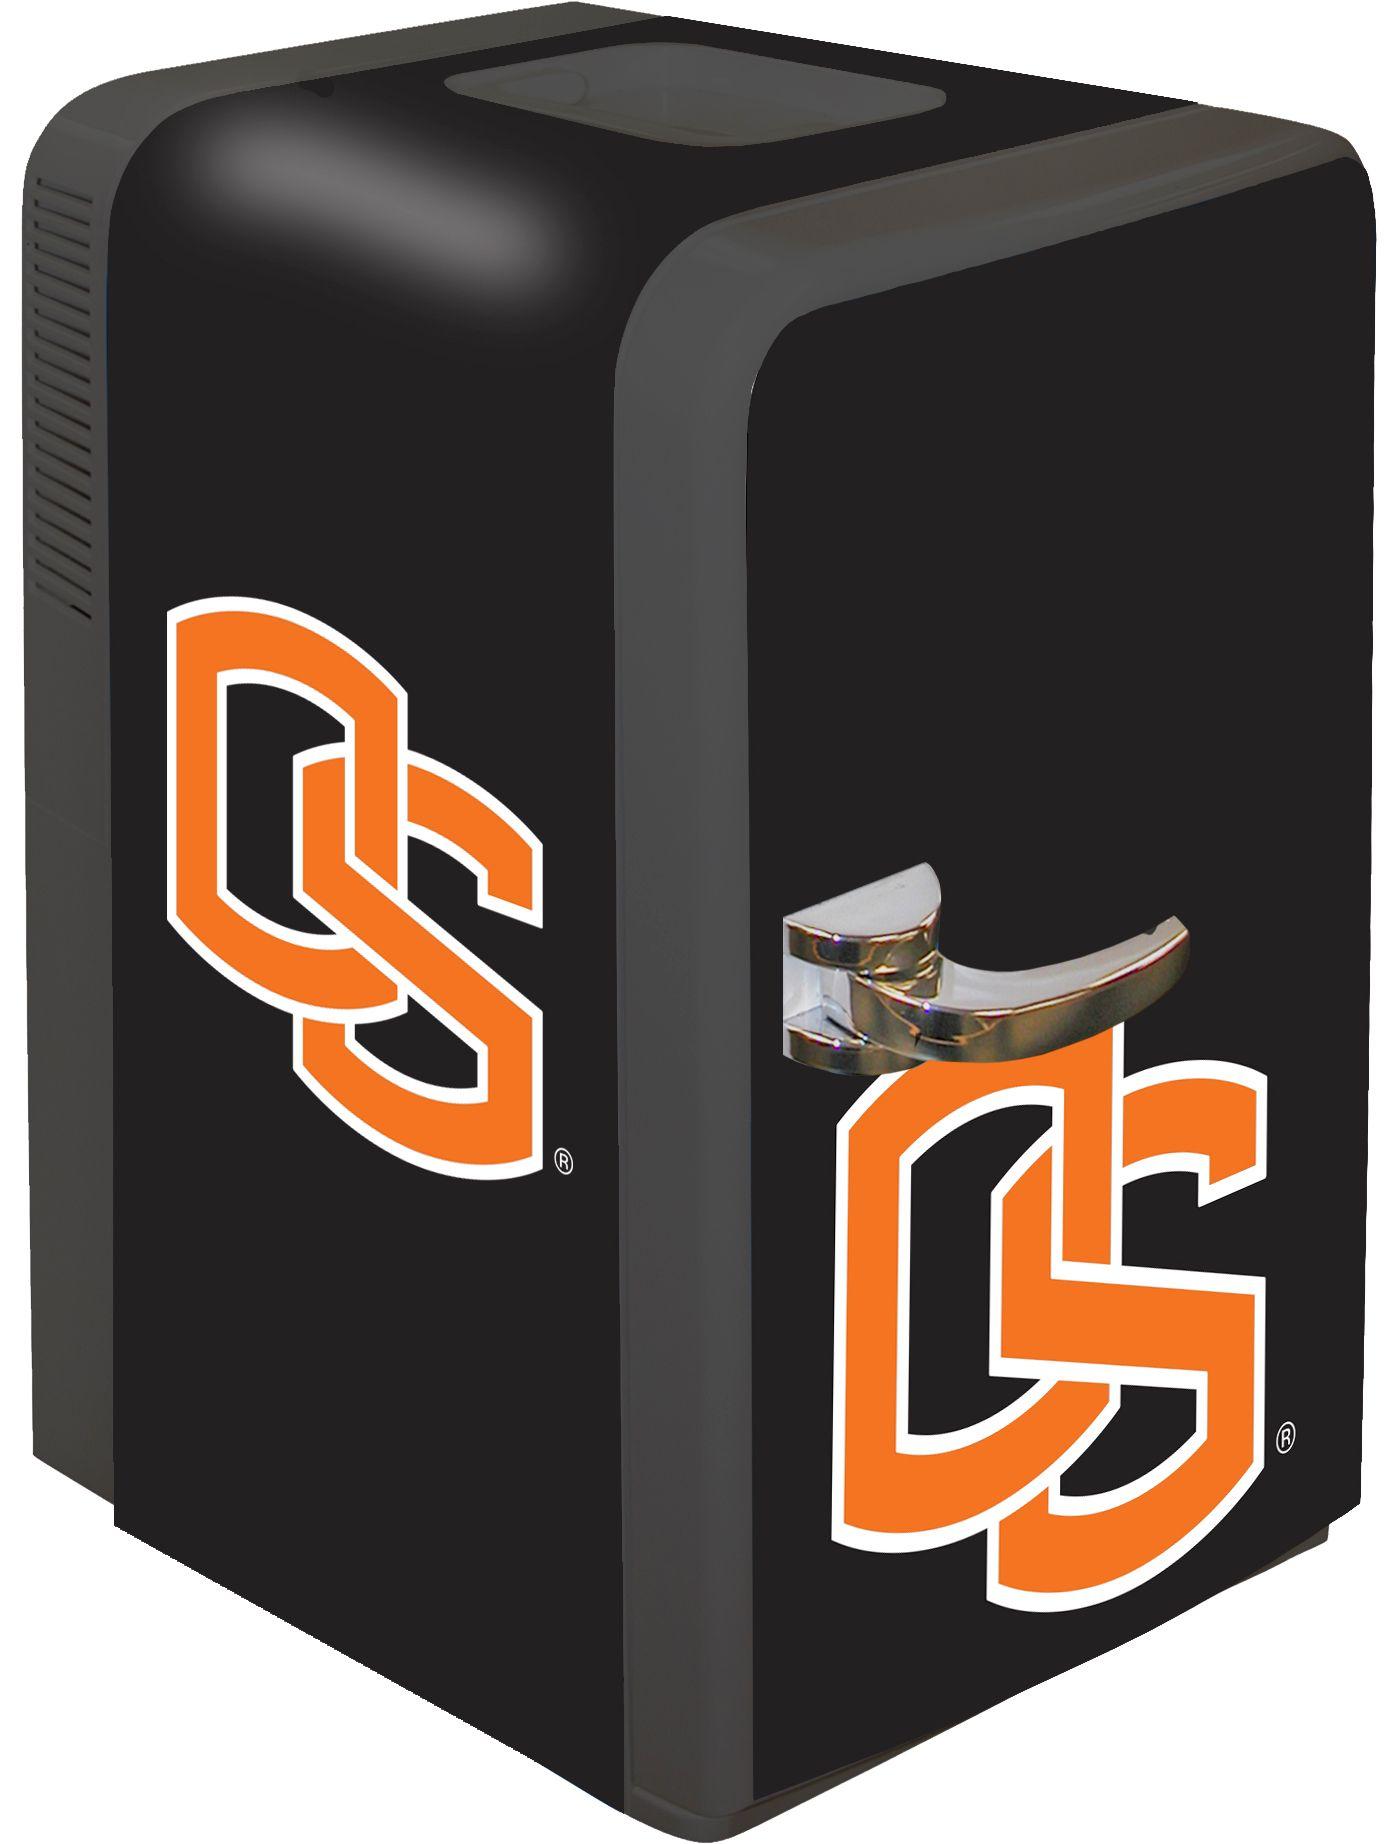 Boelter Oregon State Beavers 15q Portable Party Refrigerator